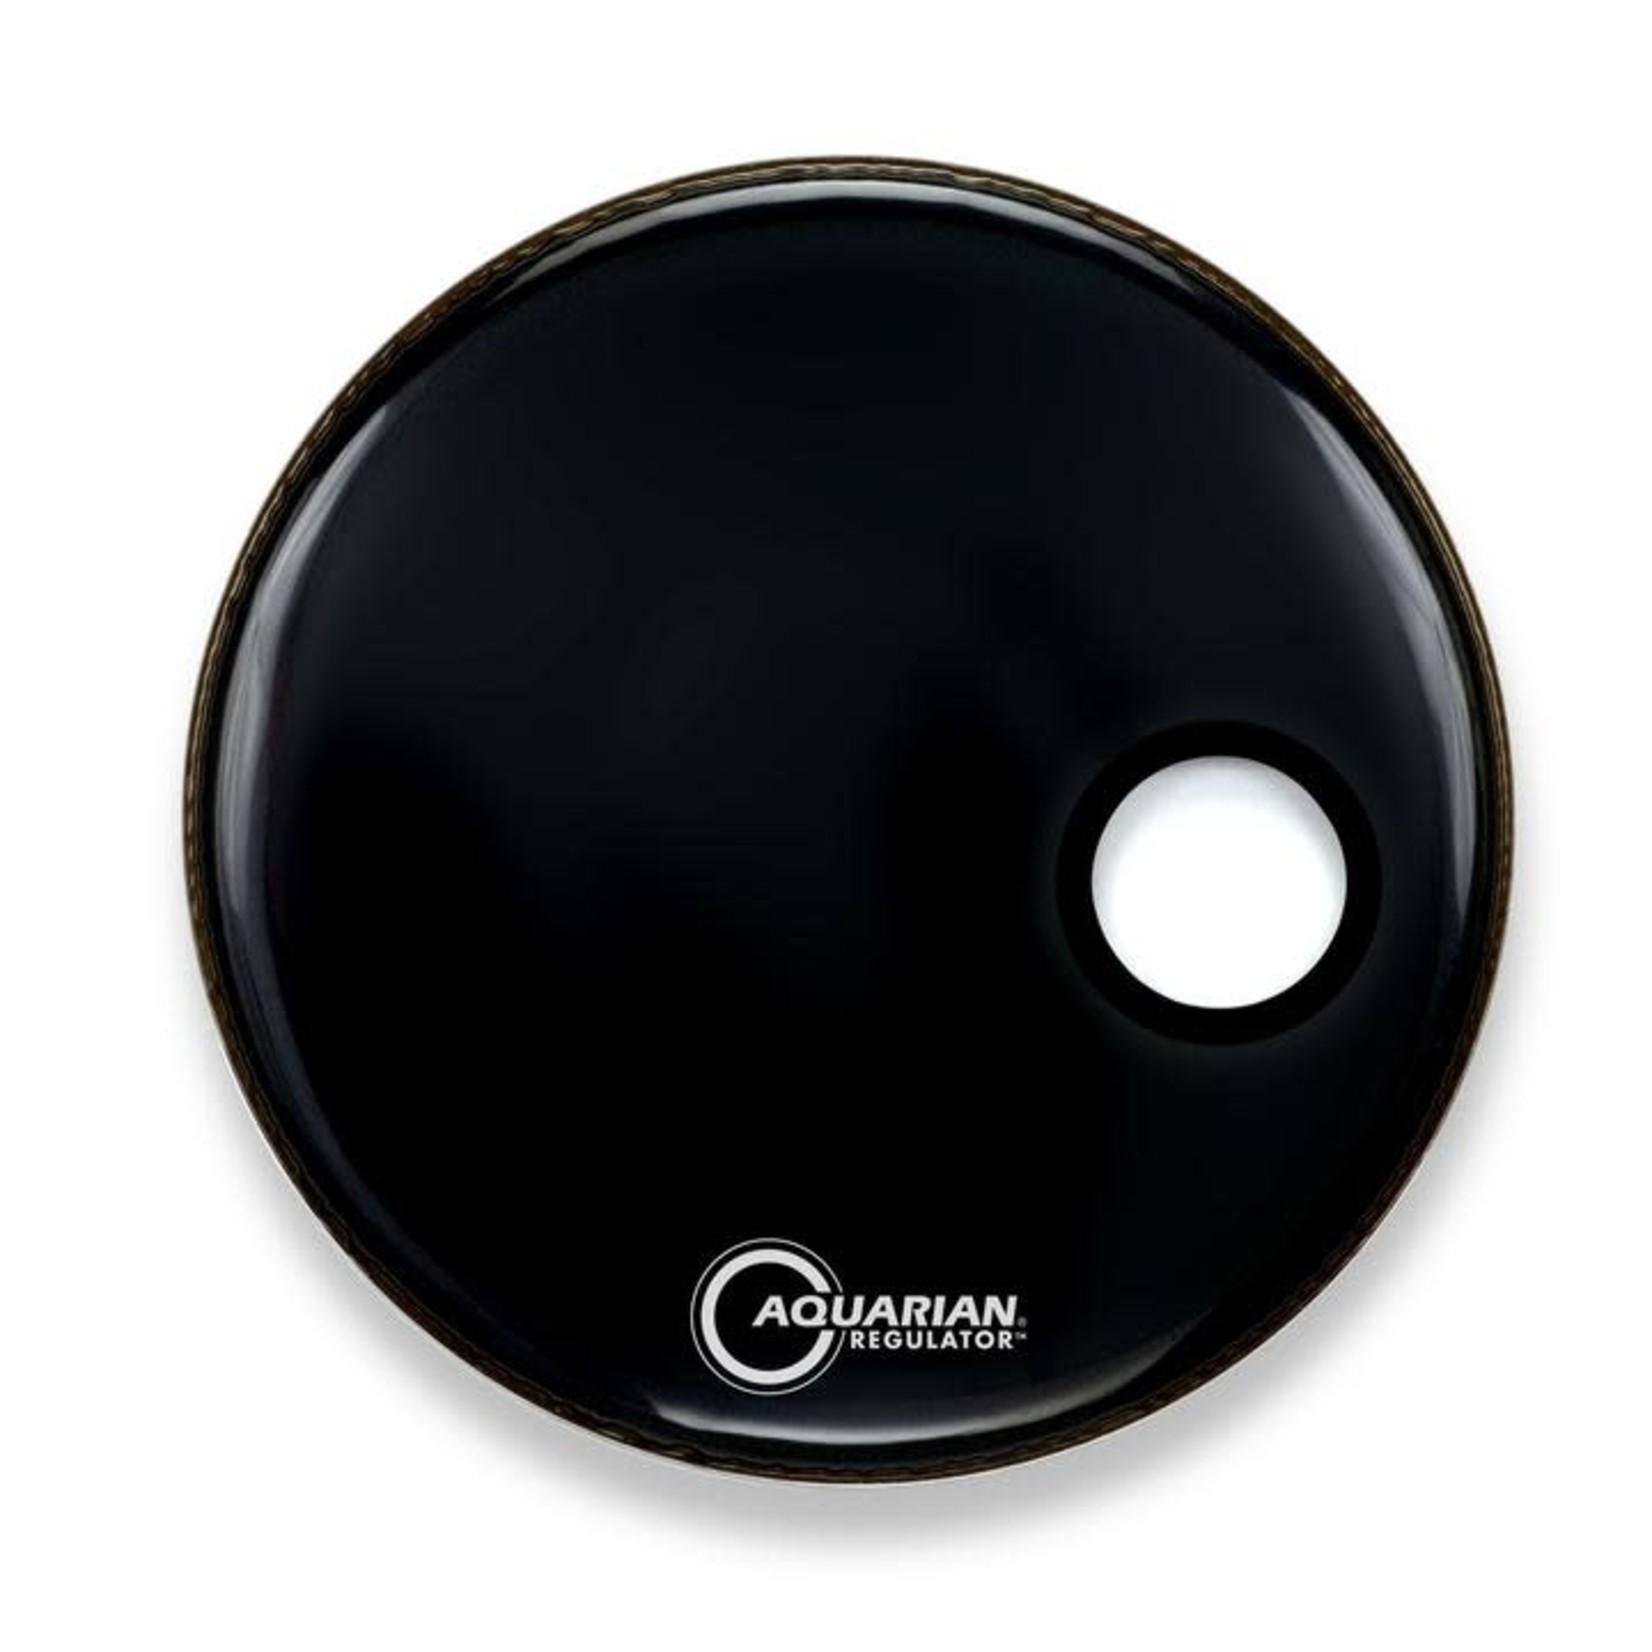 Aquarian AQUARIAN REGULATOR GLOSS BLACK W/ PORT